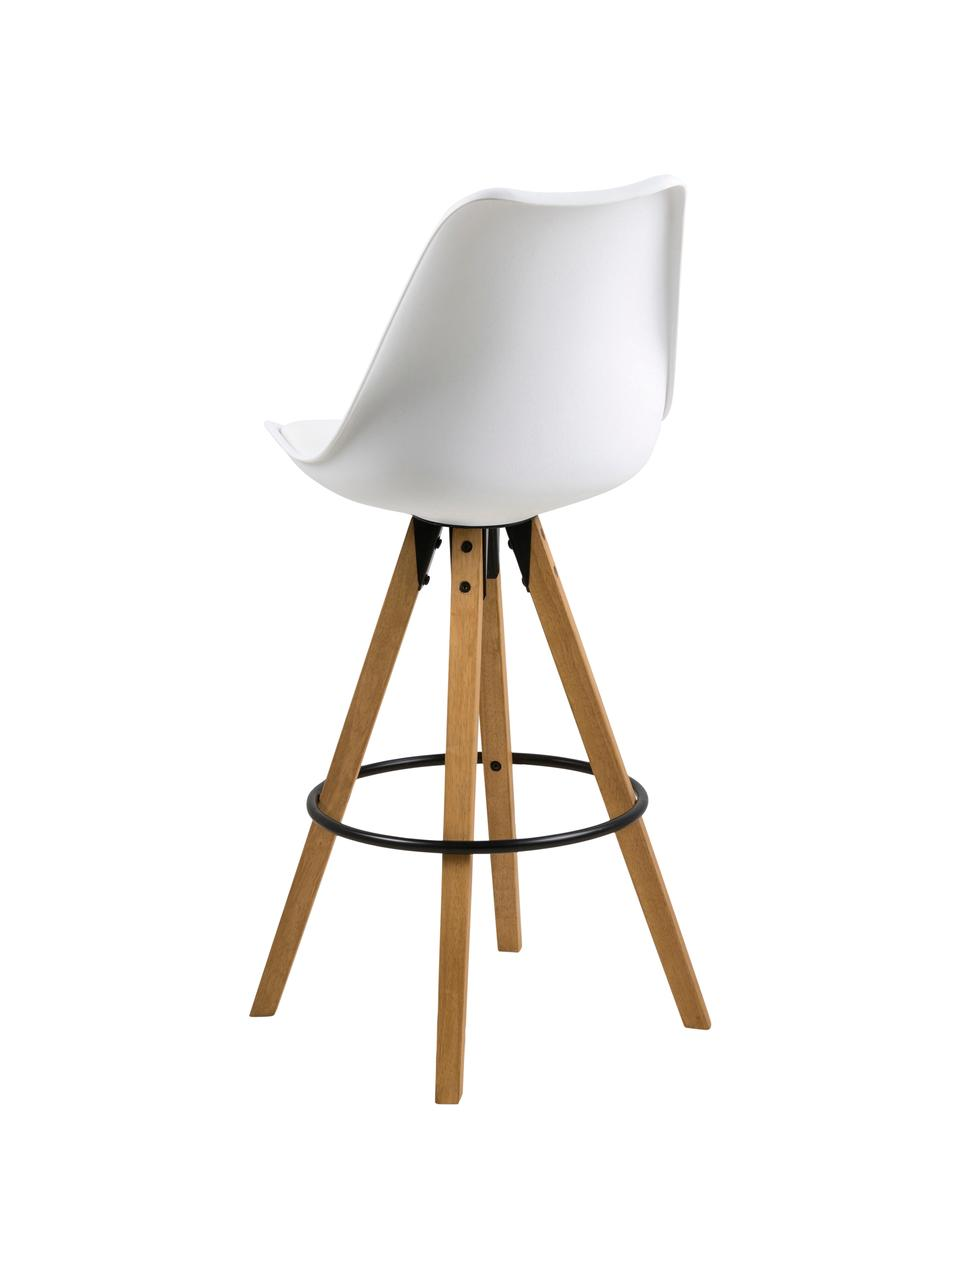 Barstühle Dima, 2 Stück, Sitzschale: Polyurethan, Bezug: Polyester, Beine: Gummibaumholz, geölt, Sitzschale: Weiß Beine: Gummibaumholz Fußstütze: Schwarz, 49 x 112 cm